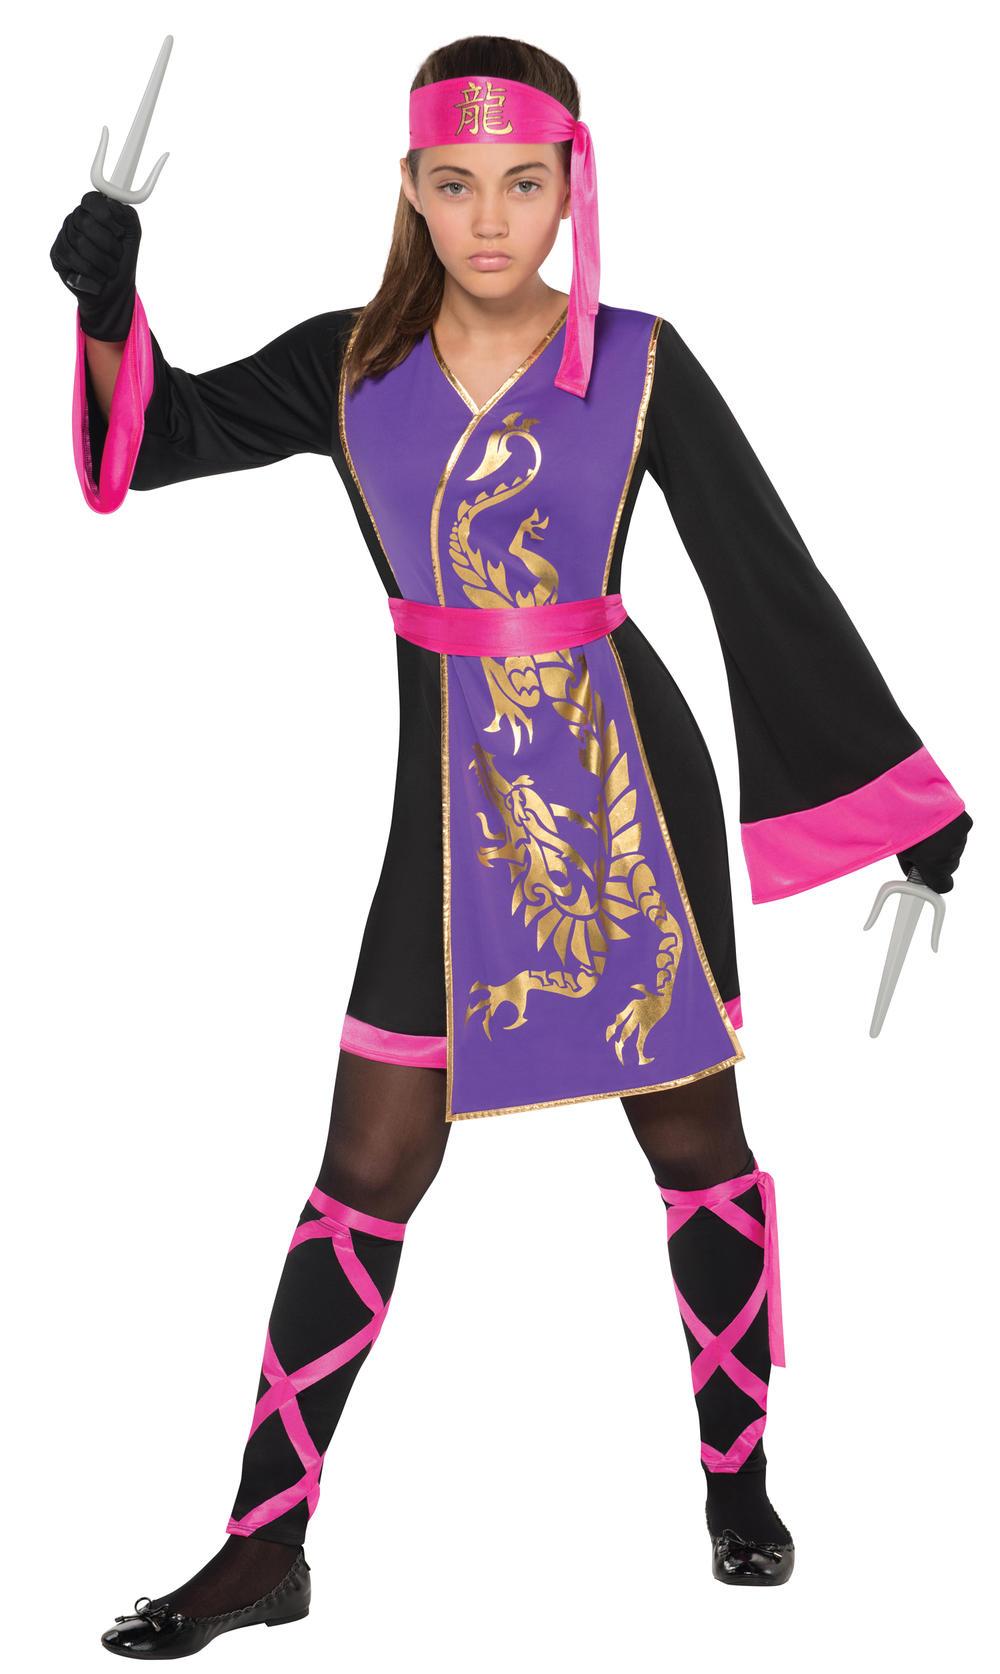 Samurai Girls Fancy Dress National Japanese Ninja Assassin Kids Childs Costume